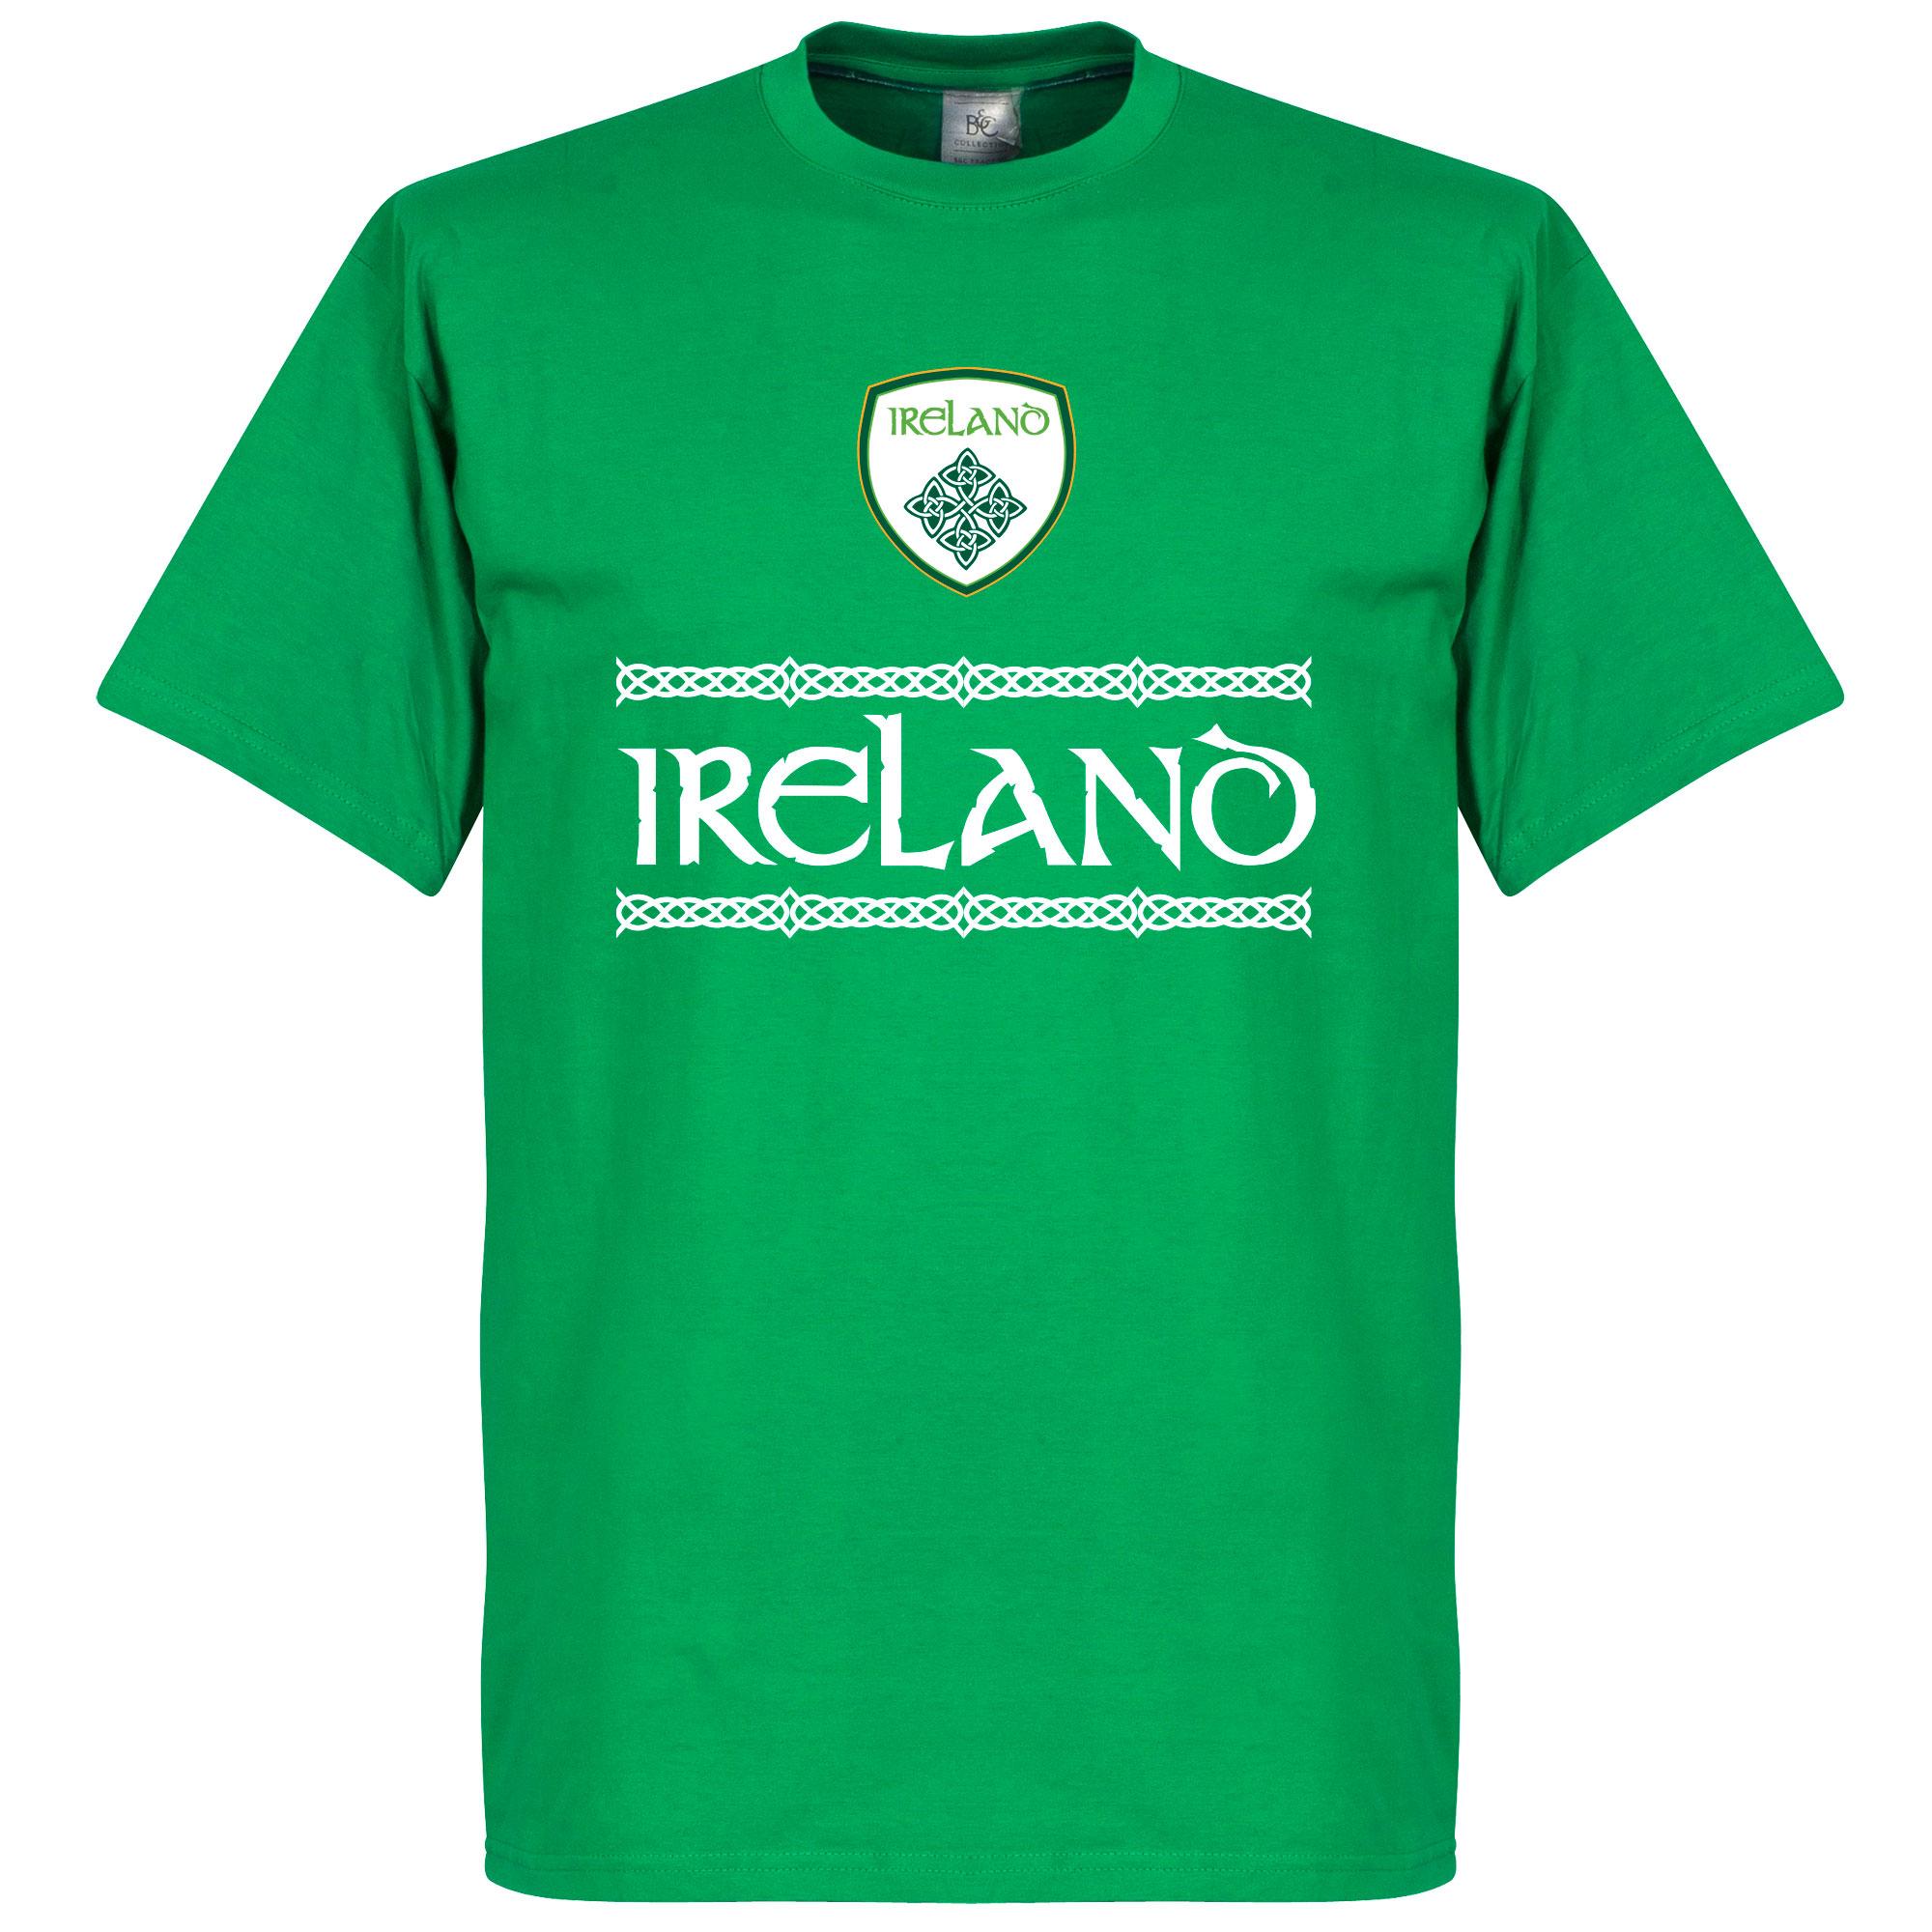 Ireland Team Tee - Green - L